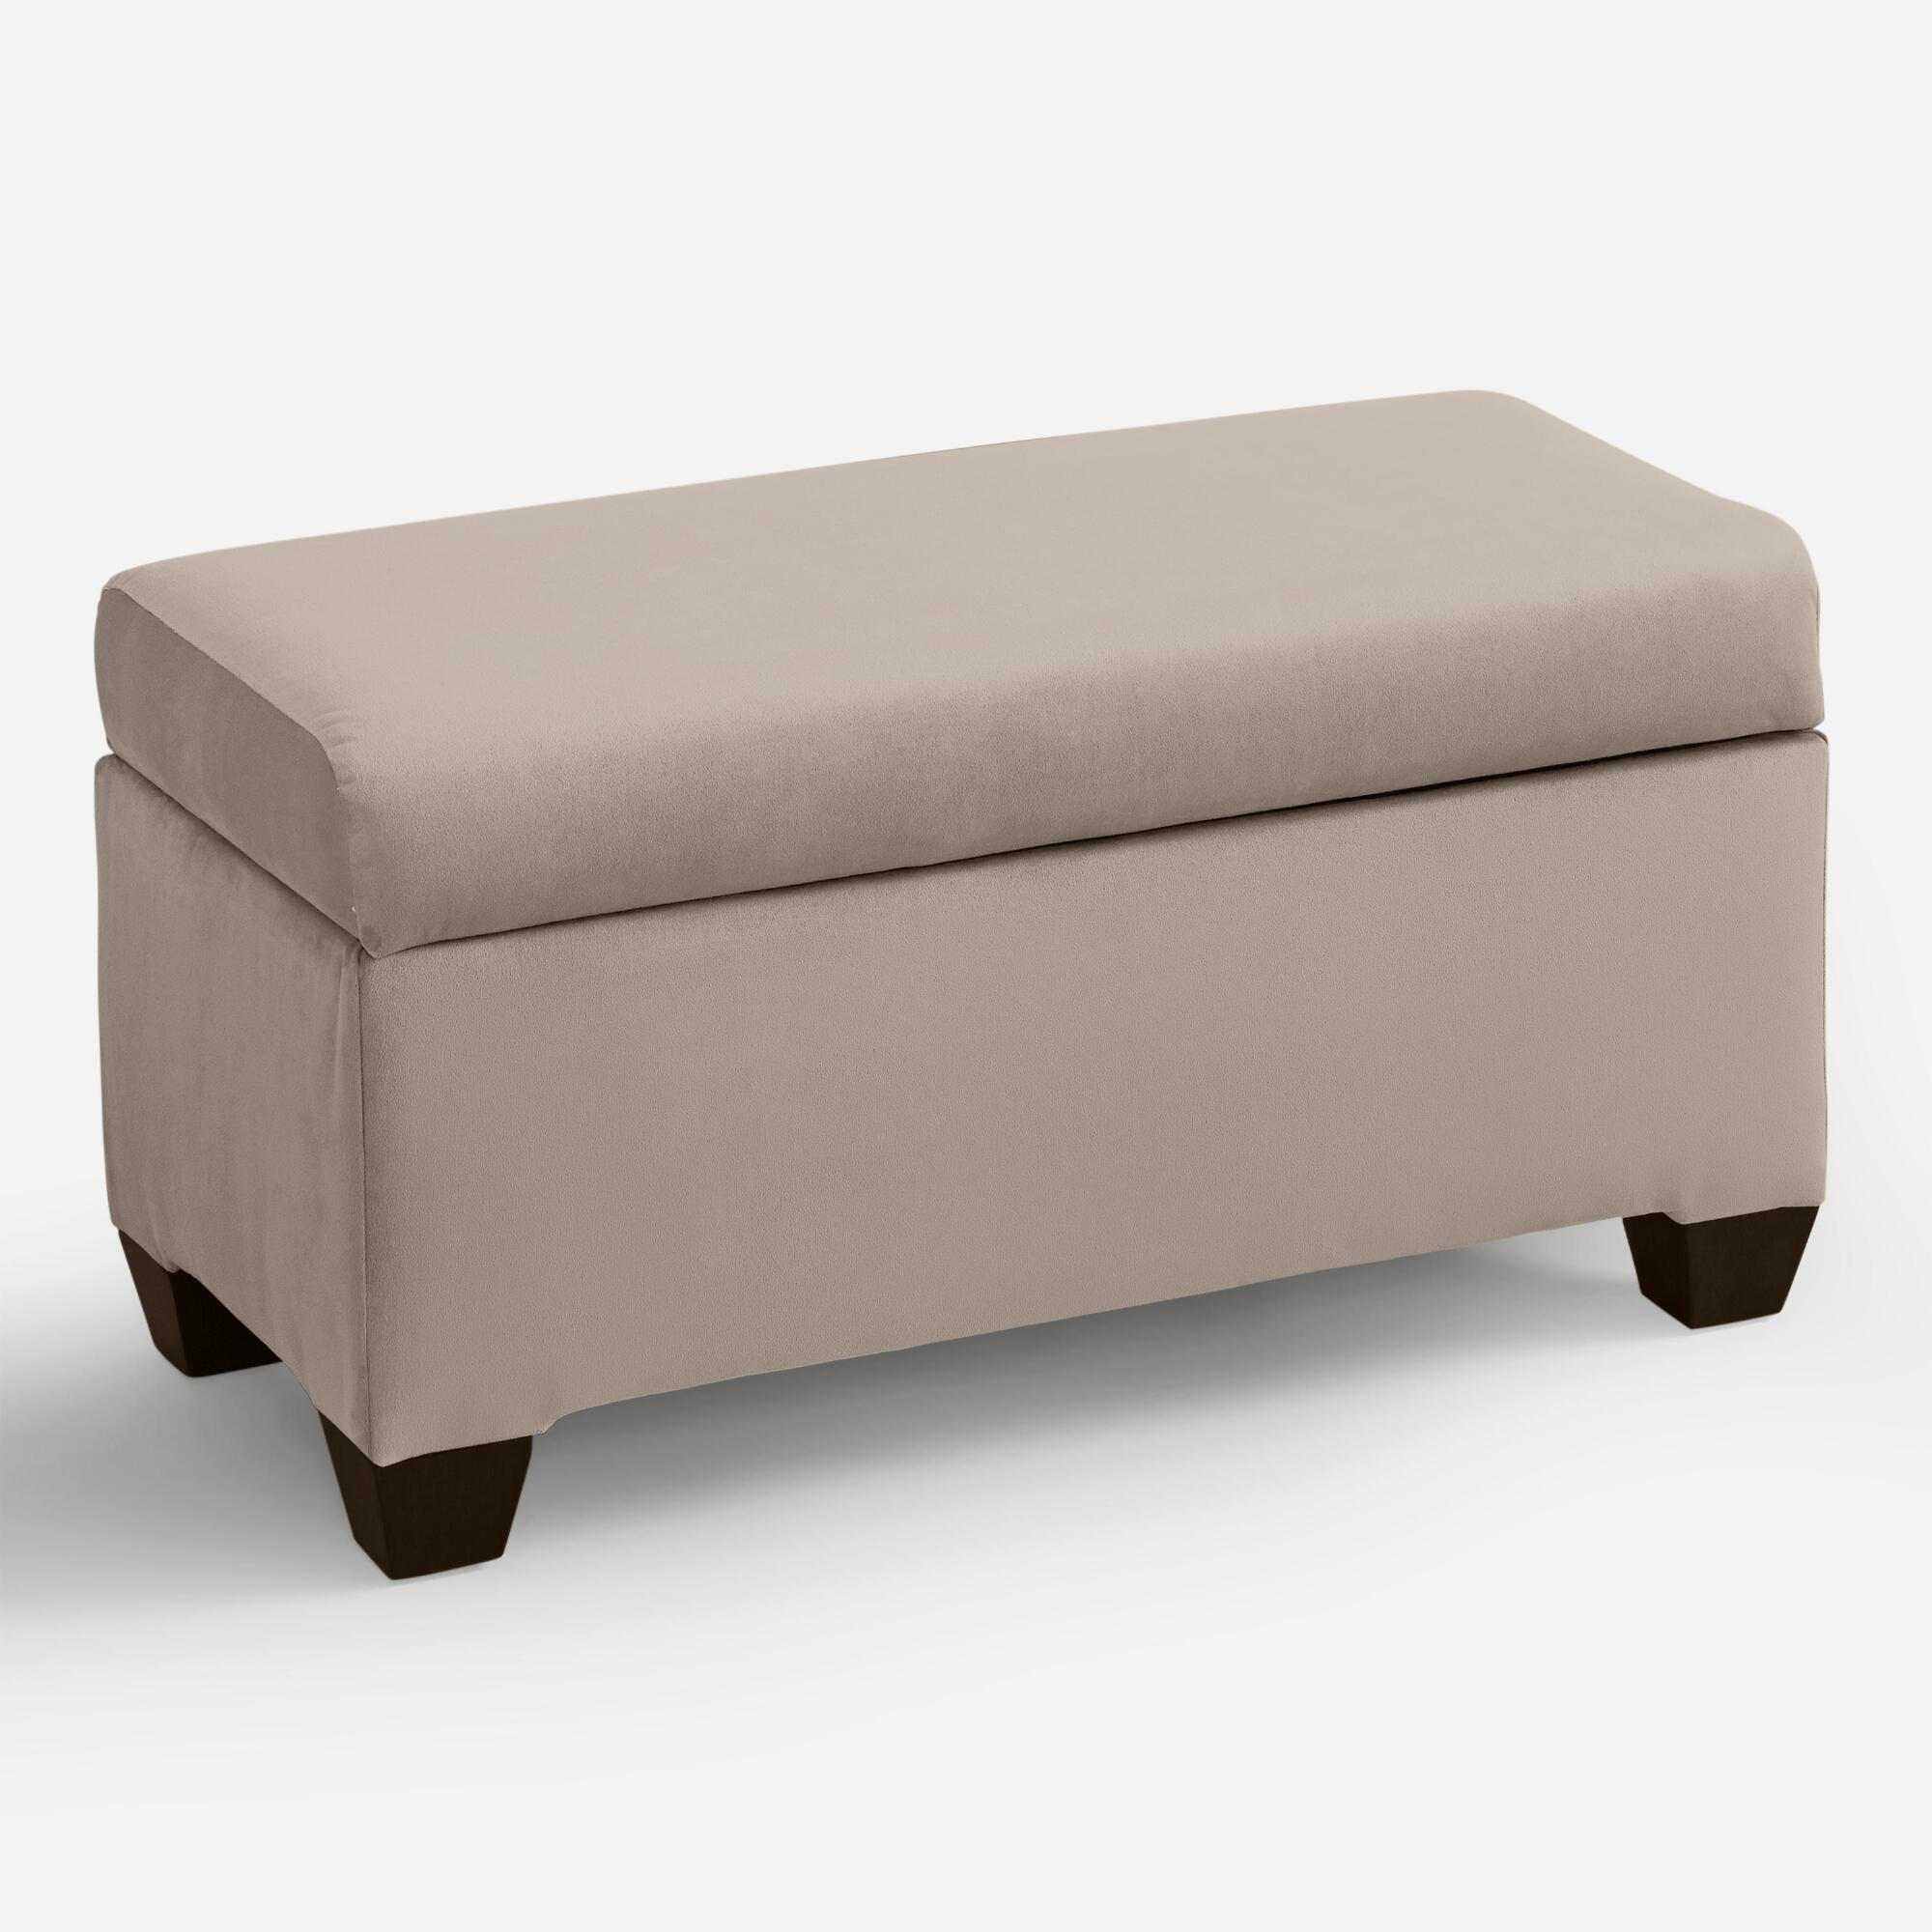 Pleasing Velvet Pembroke Upholstered Storage Bench Blue Fabric Andrewgaddart Wooden Chair Designs For Living Room Andrewgaddartcom